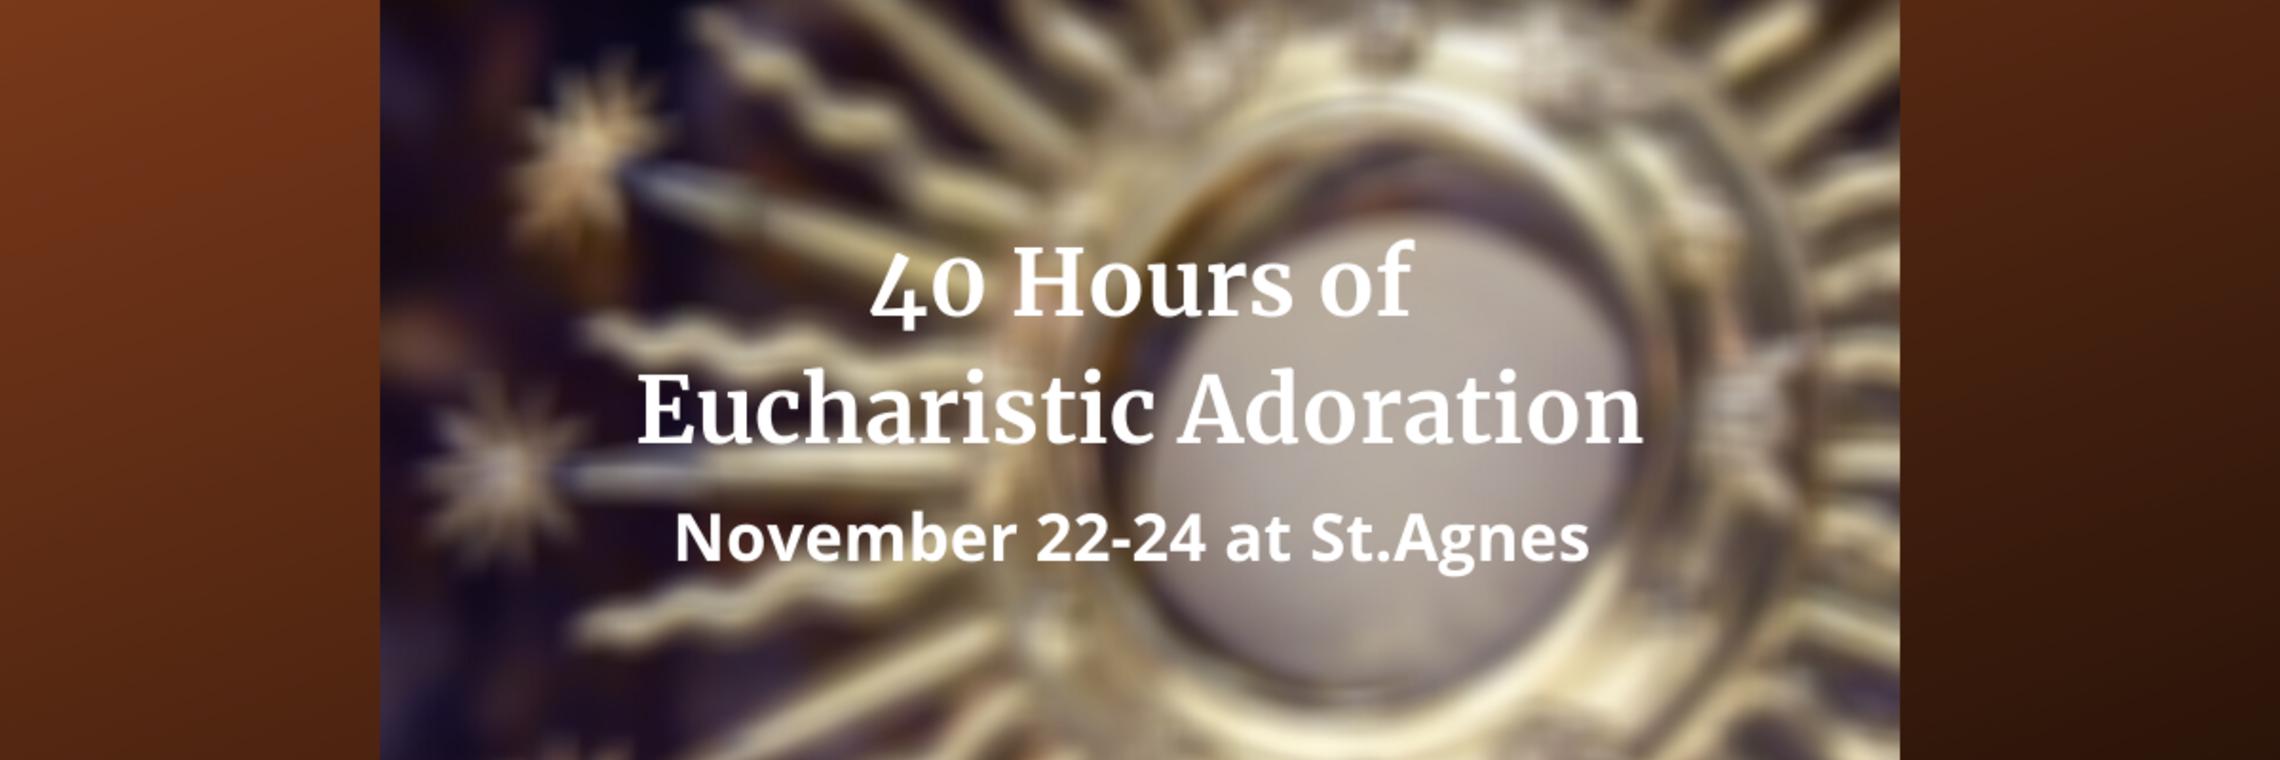 40 Hours Of Eucharistic Adoration 2